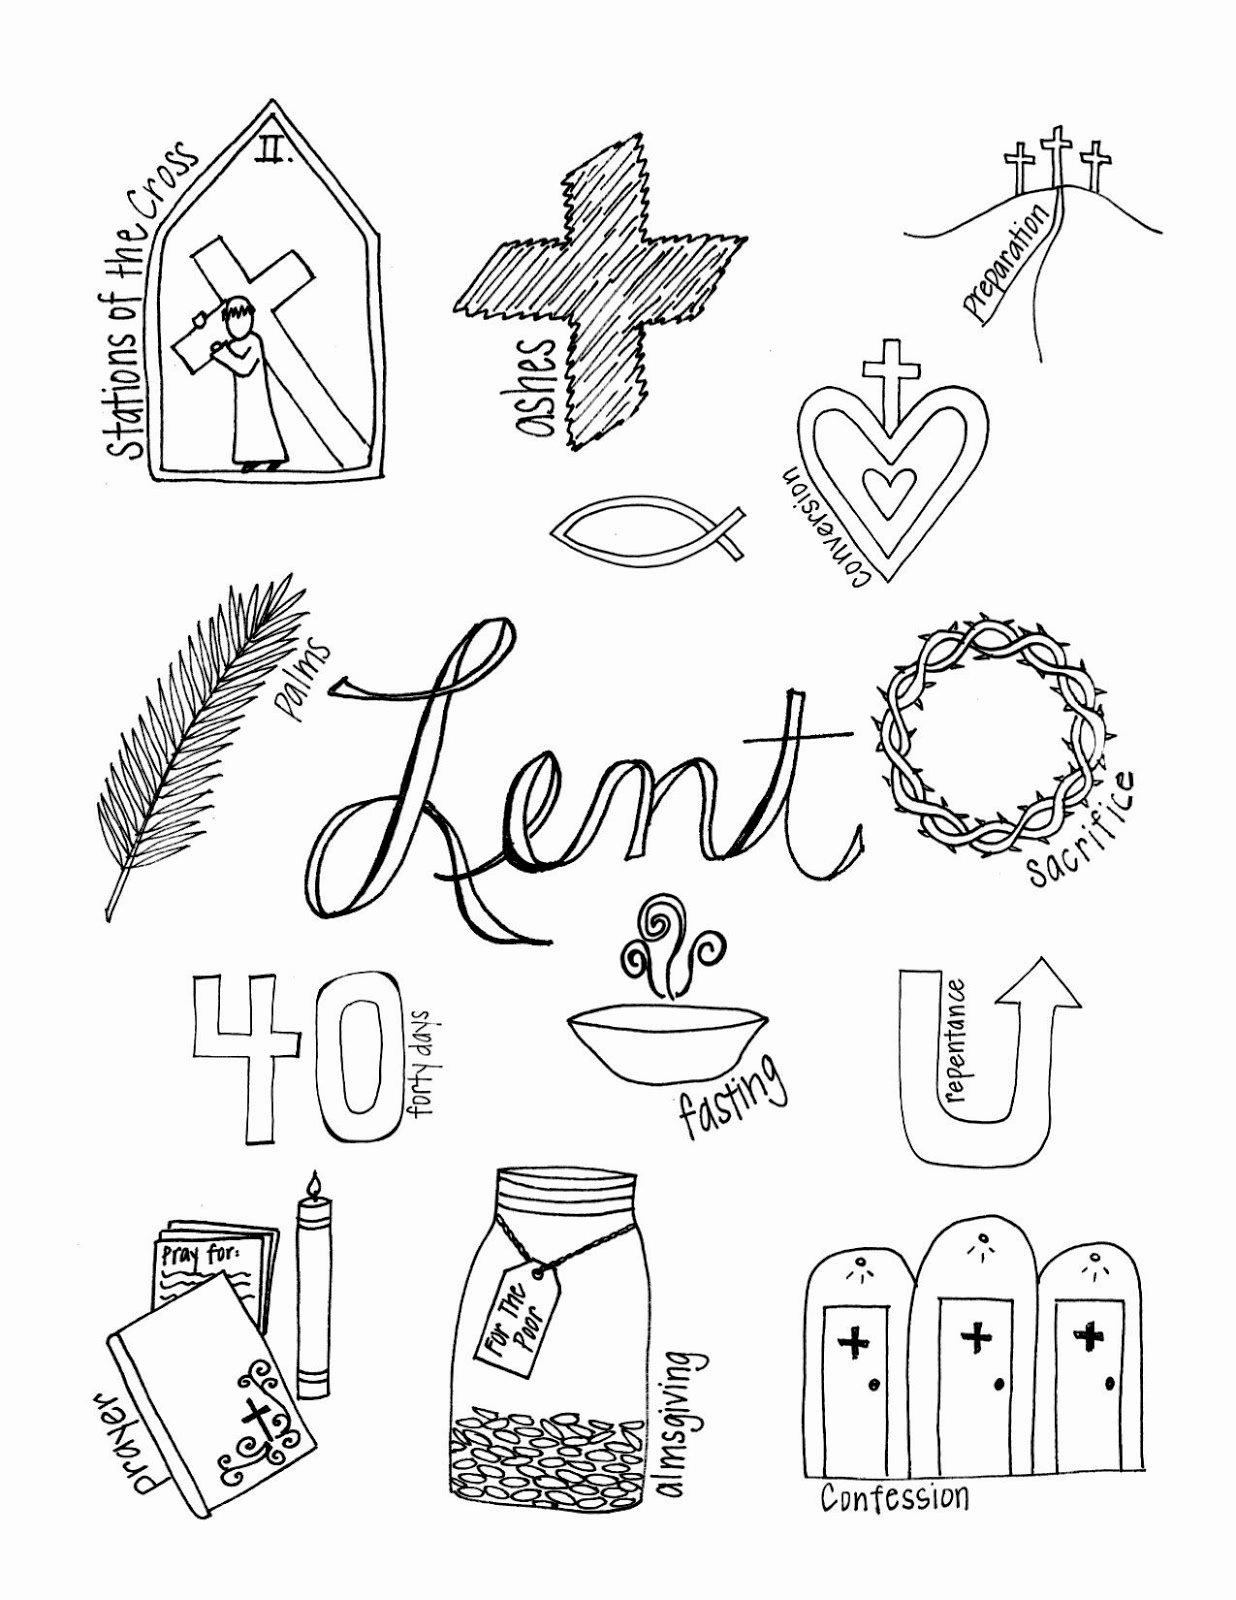 School Bus Worksheets for Preschoolers Beautiful No School Free Clipart Magic Bus Worksheets Coloring Lent